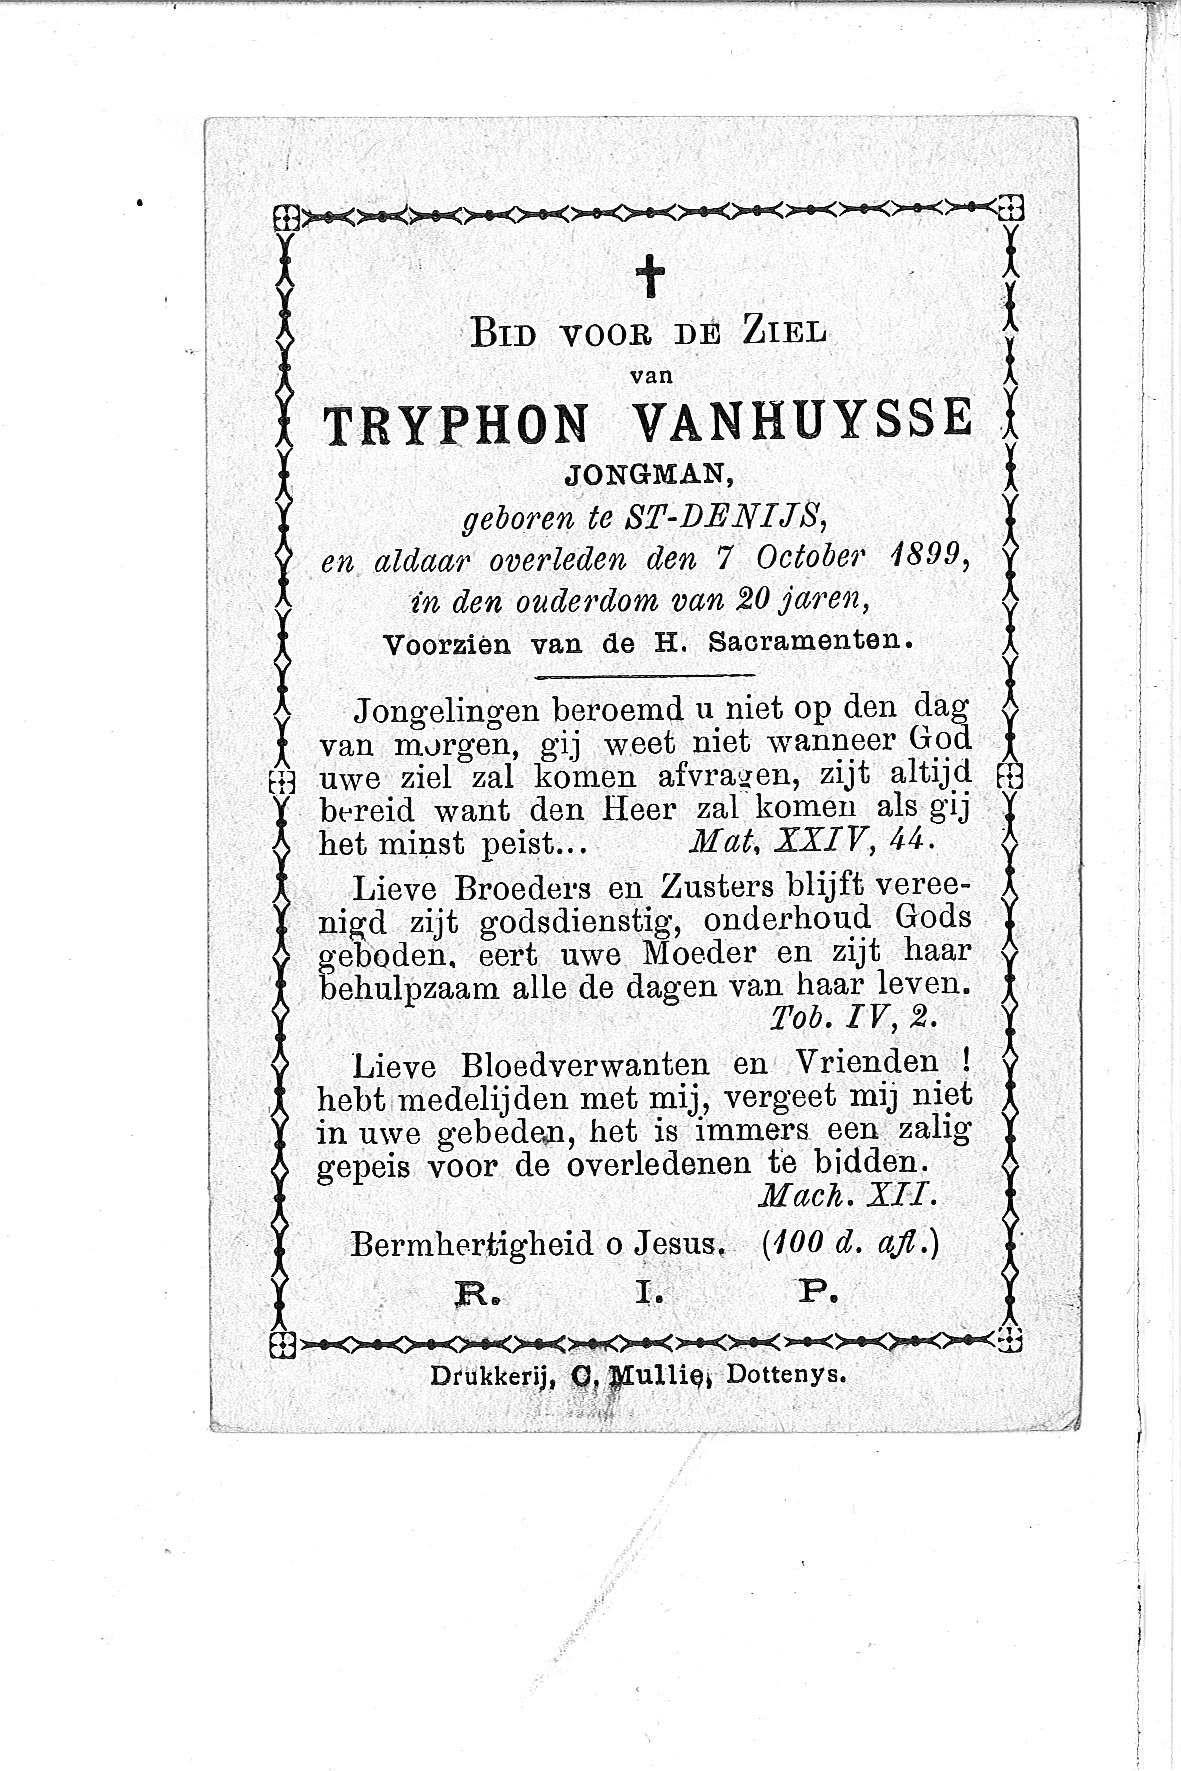 Tryphon(1899)20100611100754_00015.jpg